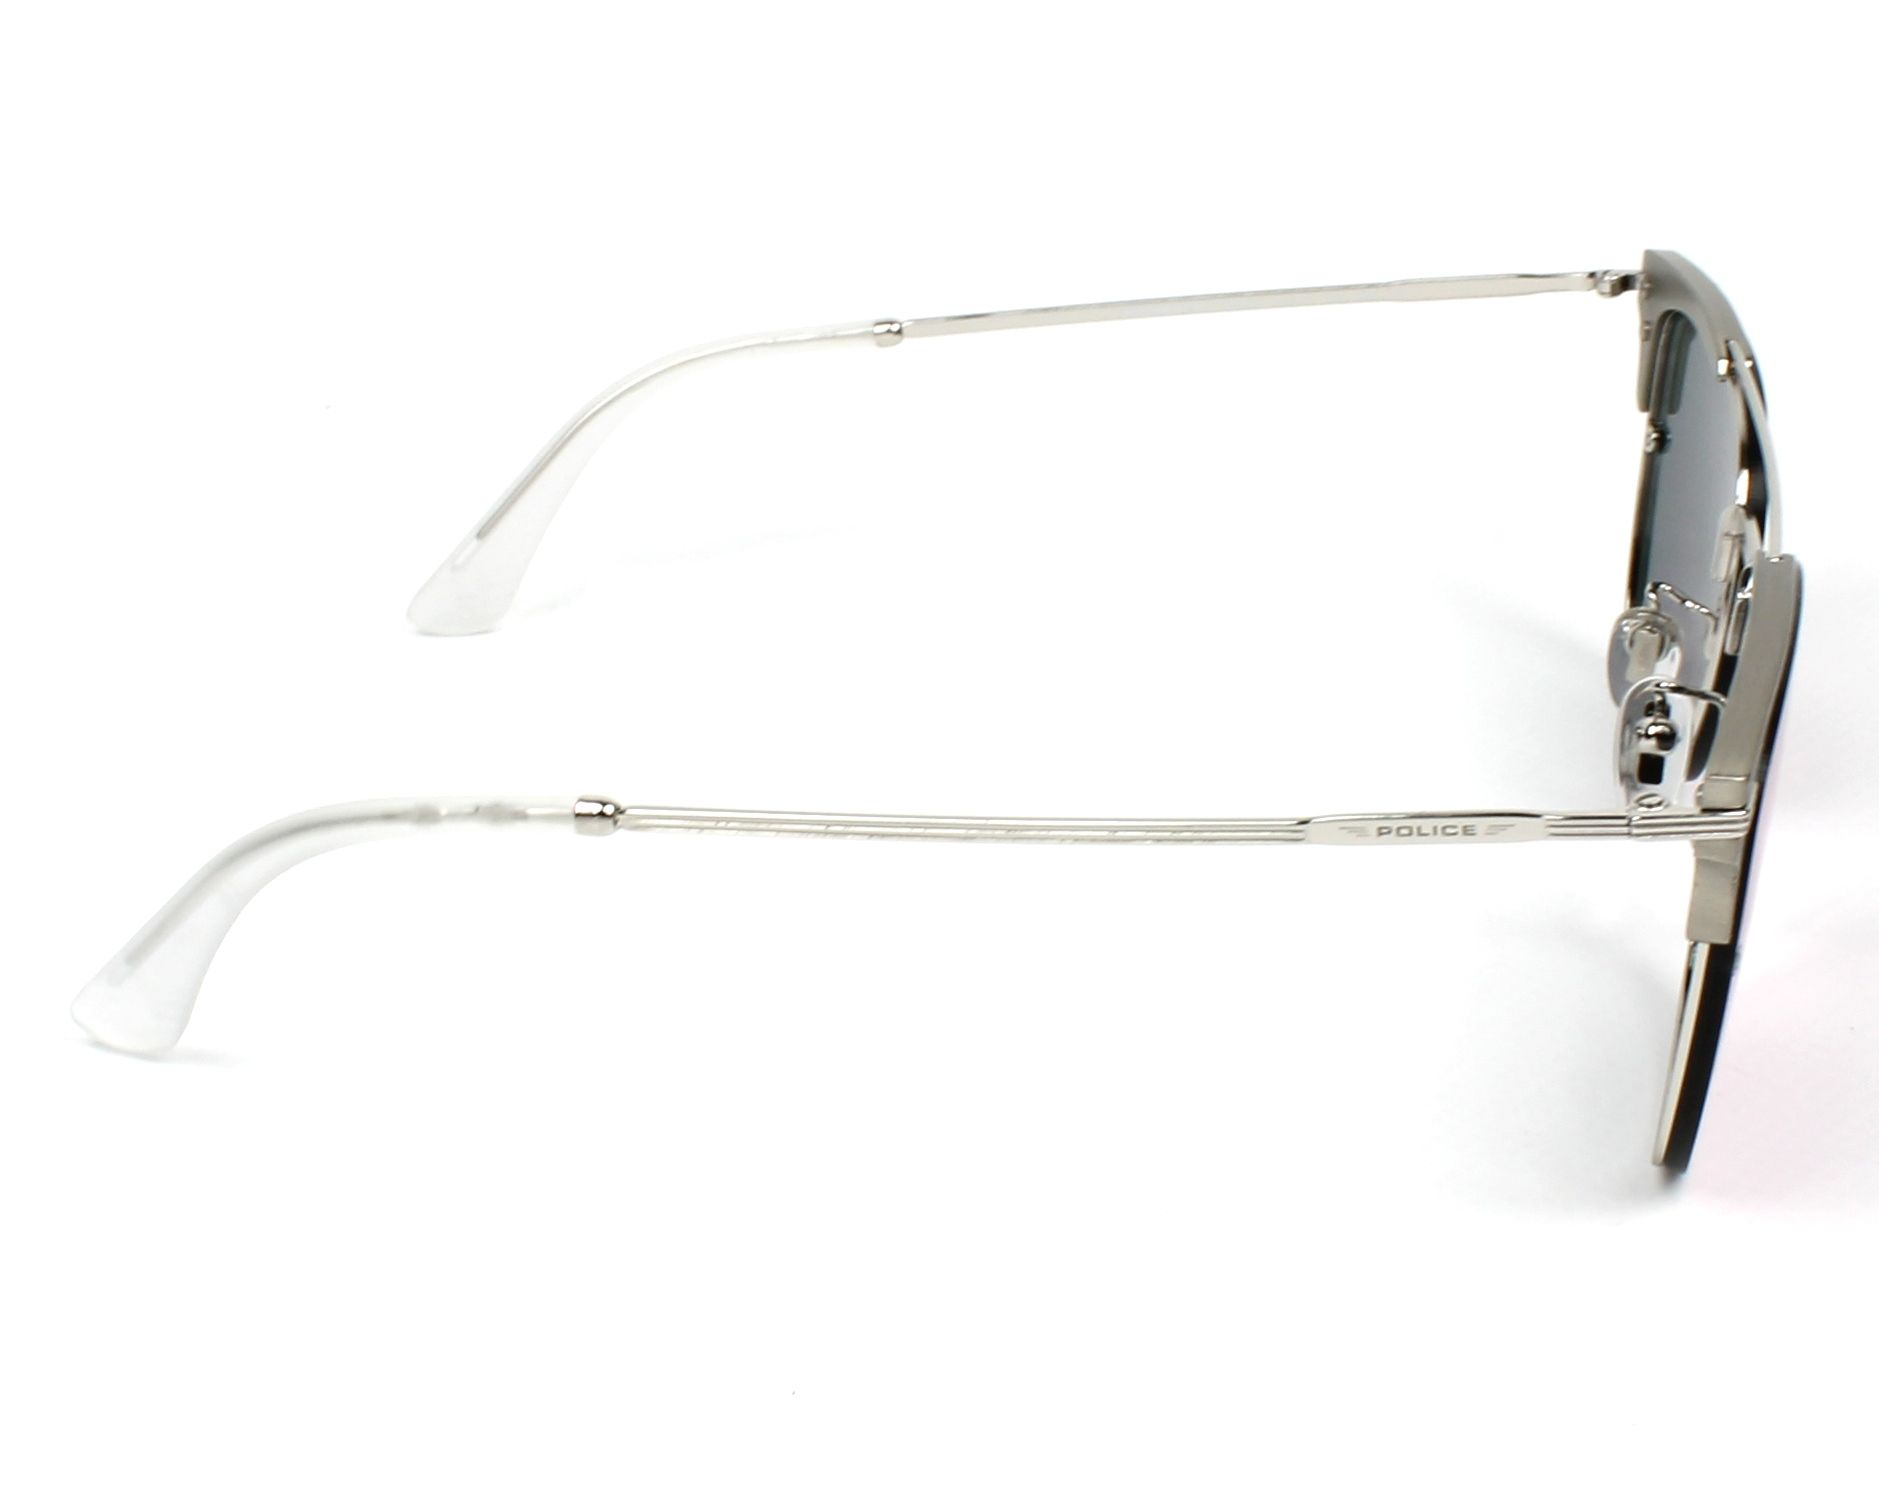 8f0a317c91d Sunglasses Police SPL-577 579V 56-17 Silver Gun side view